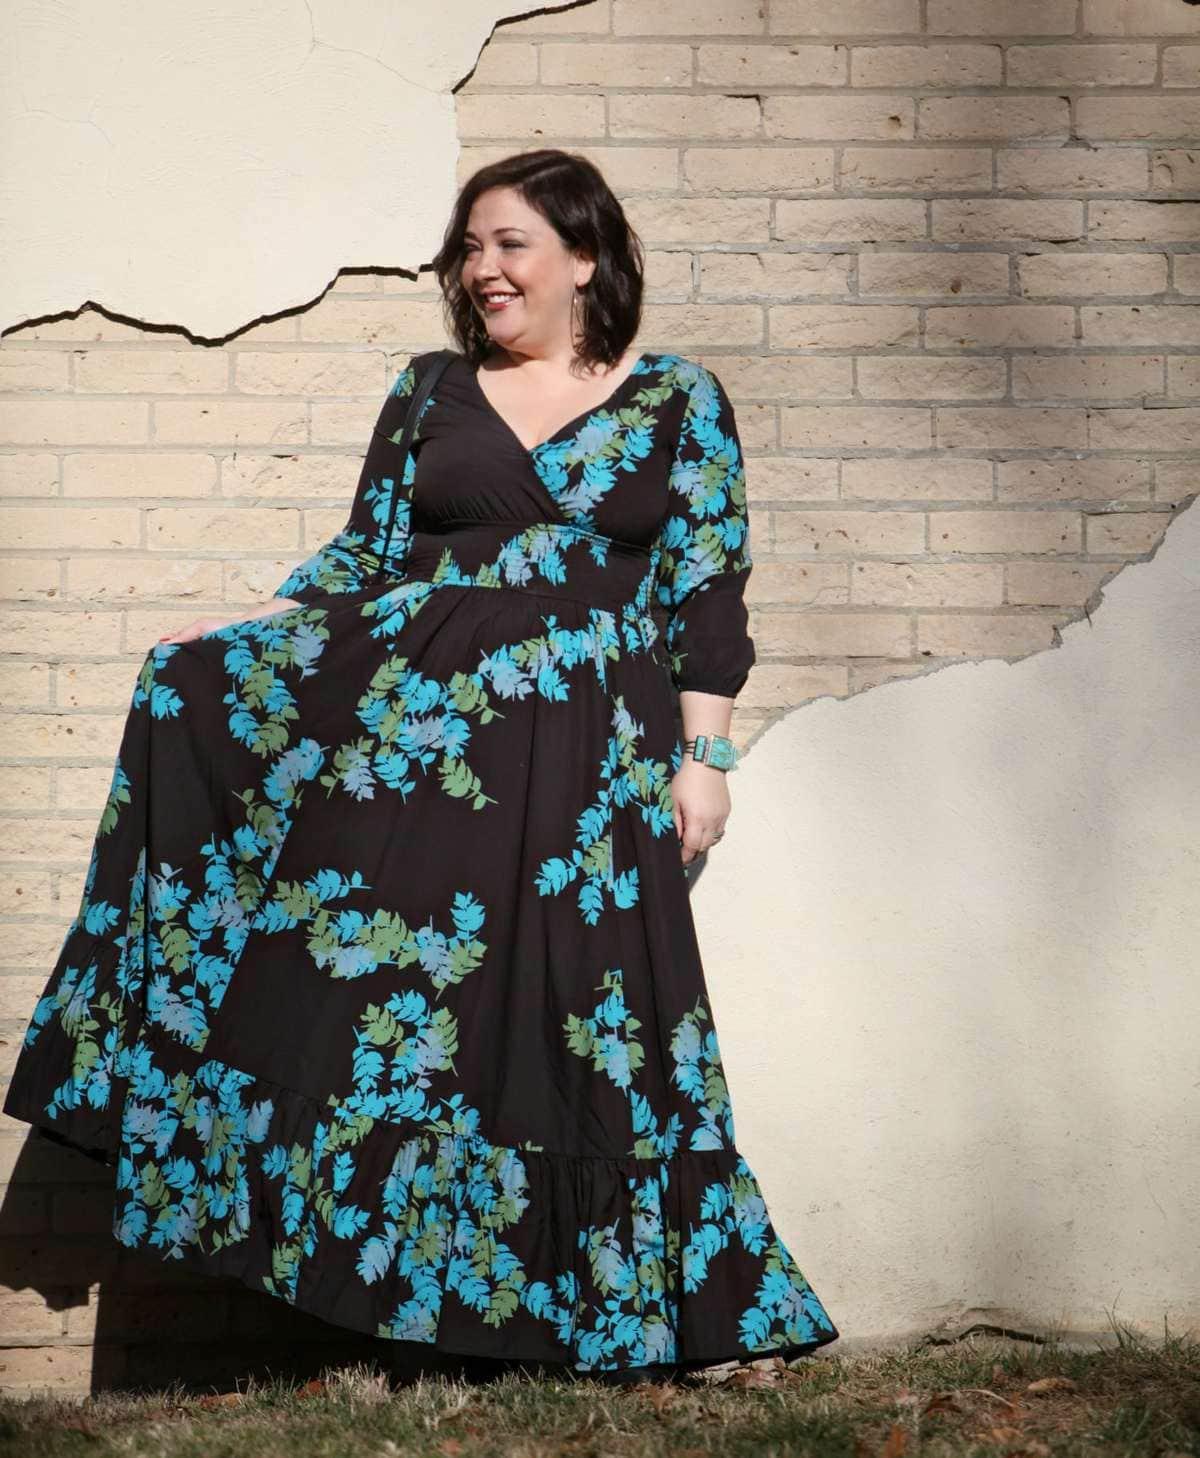 wardrobe oxygen in an eshakti floral maxi dress